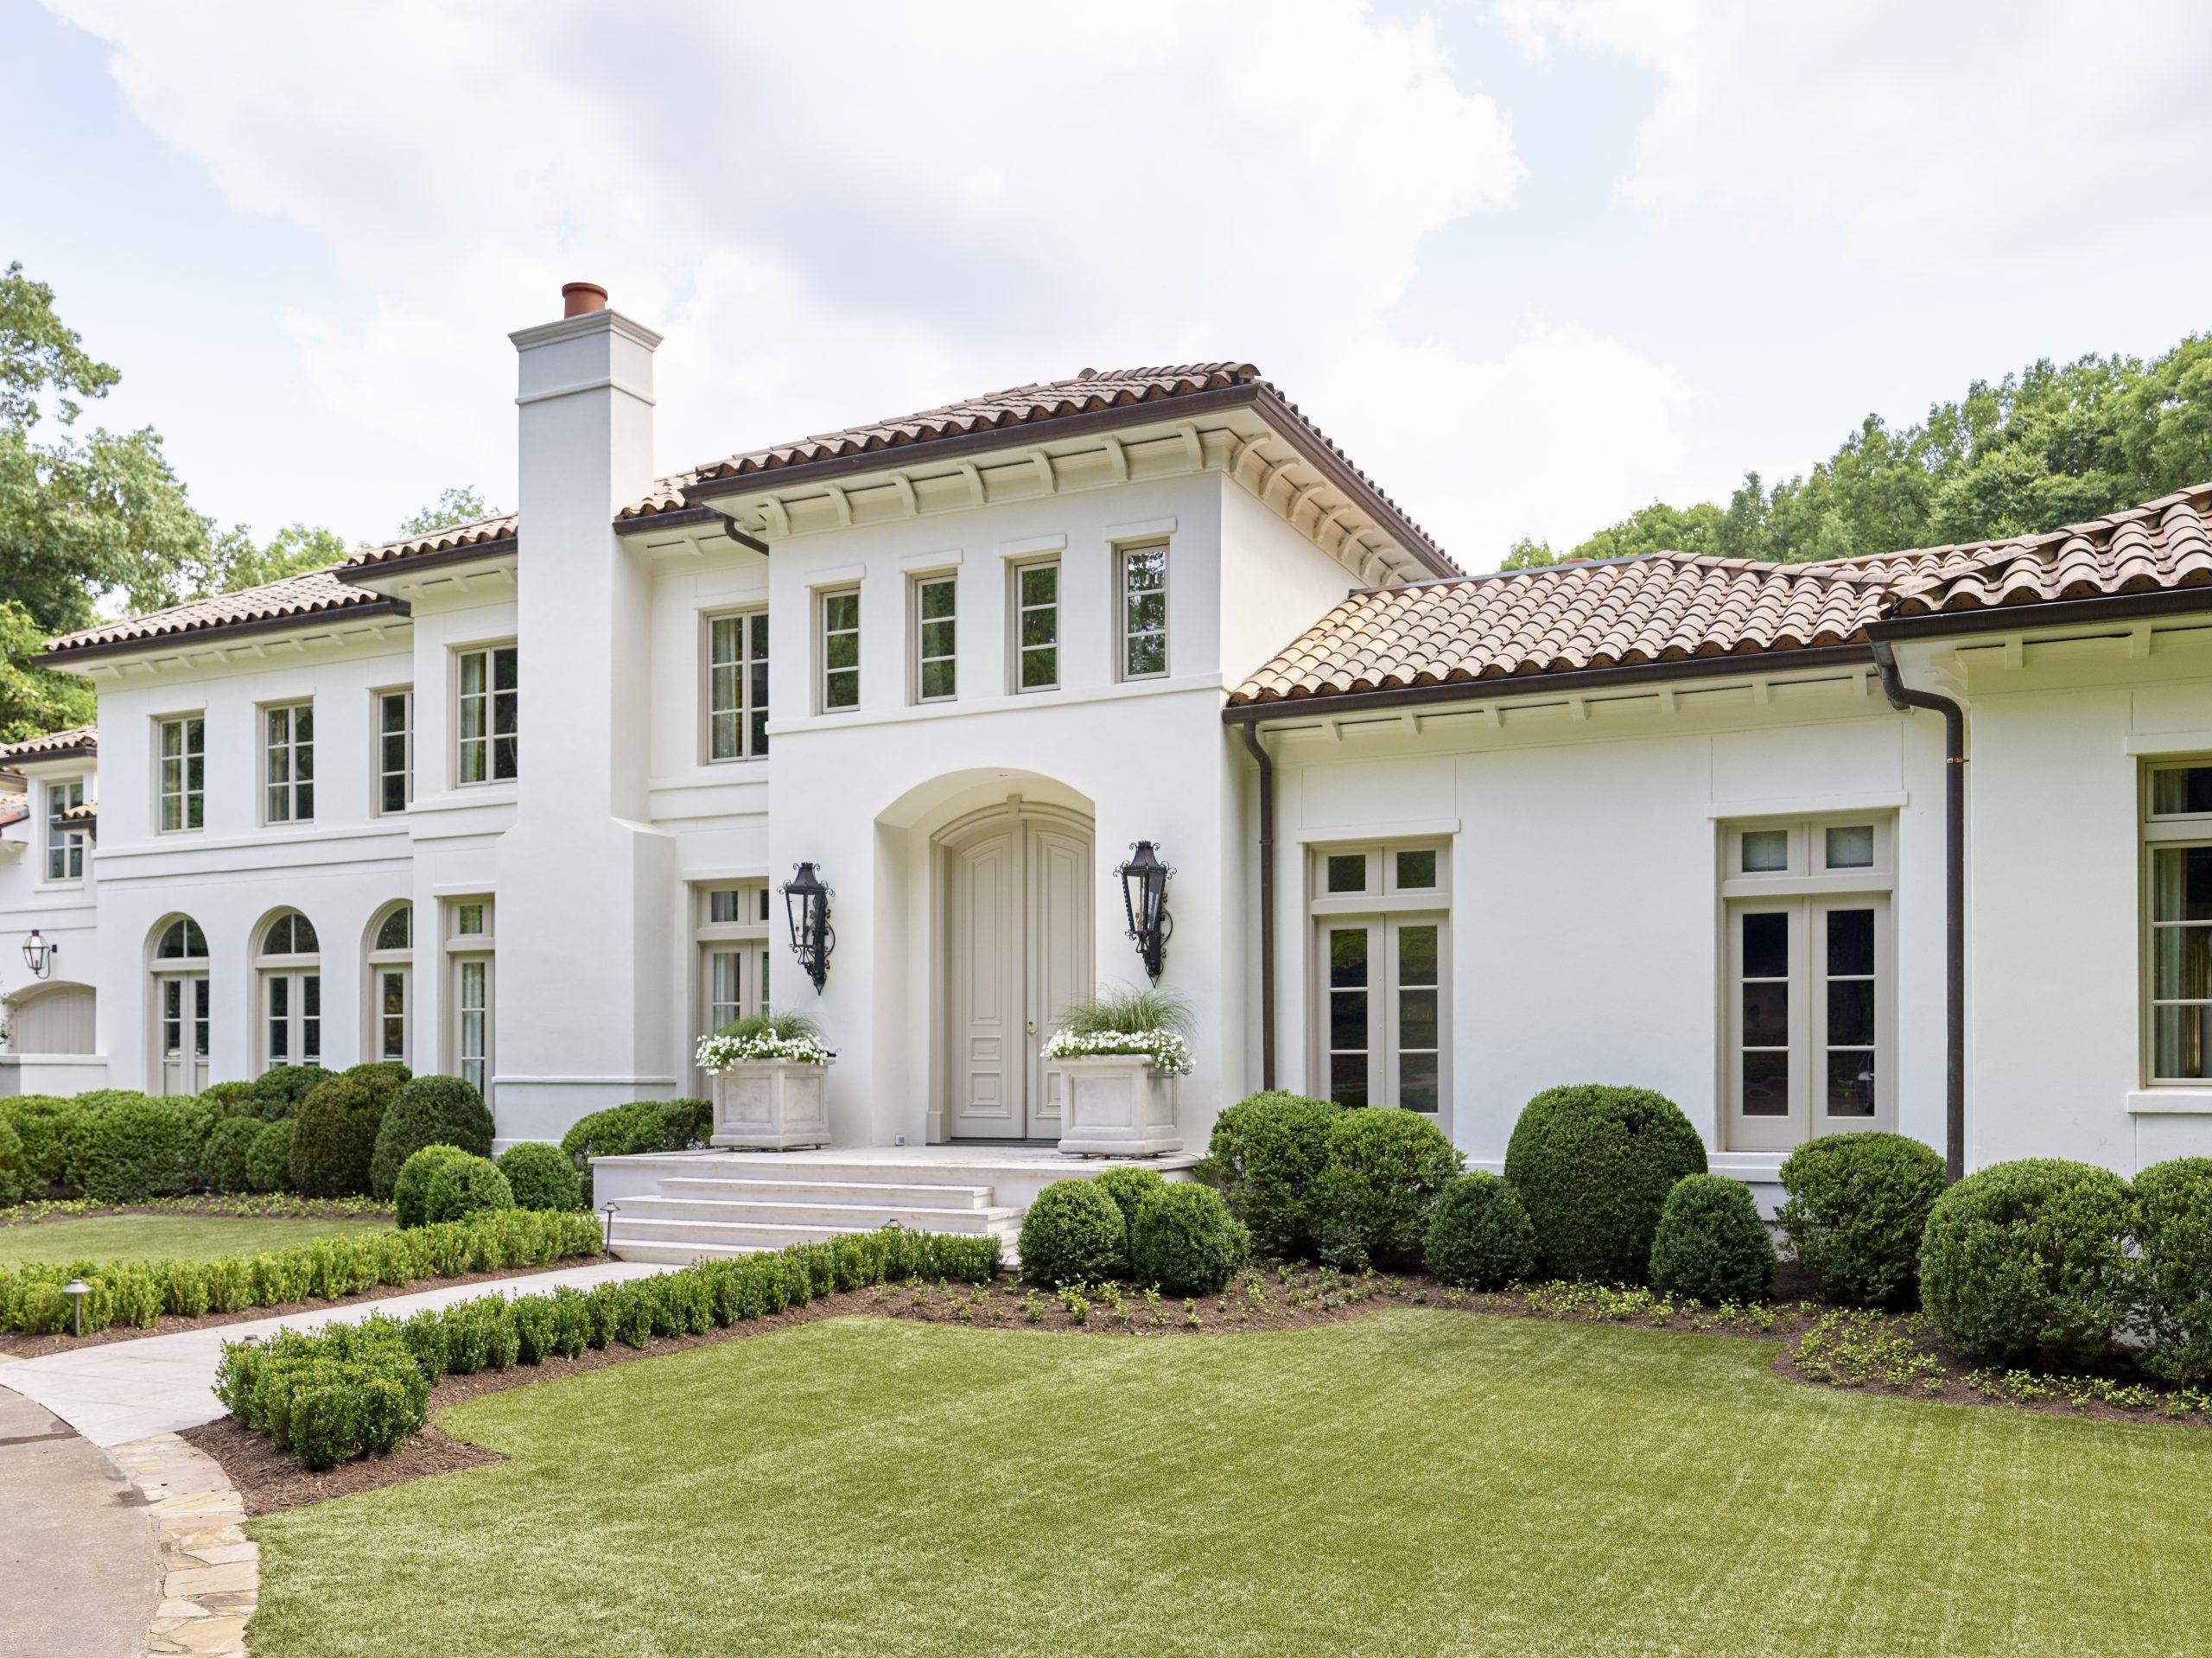 2020 Southeastern Designer Showhouse & Gardens